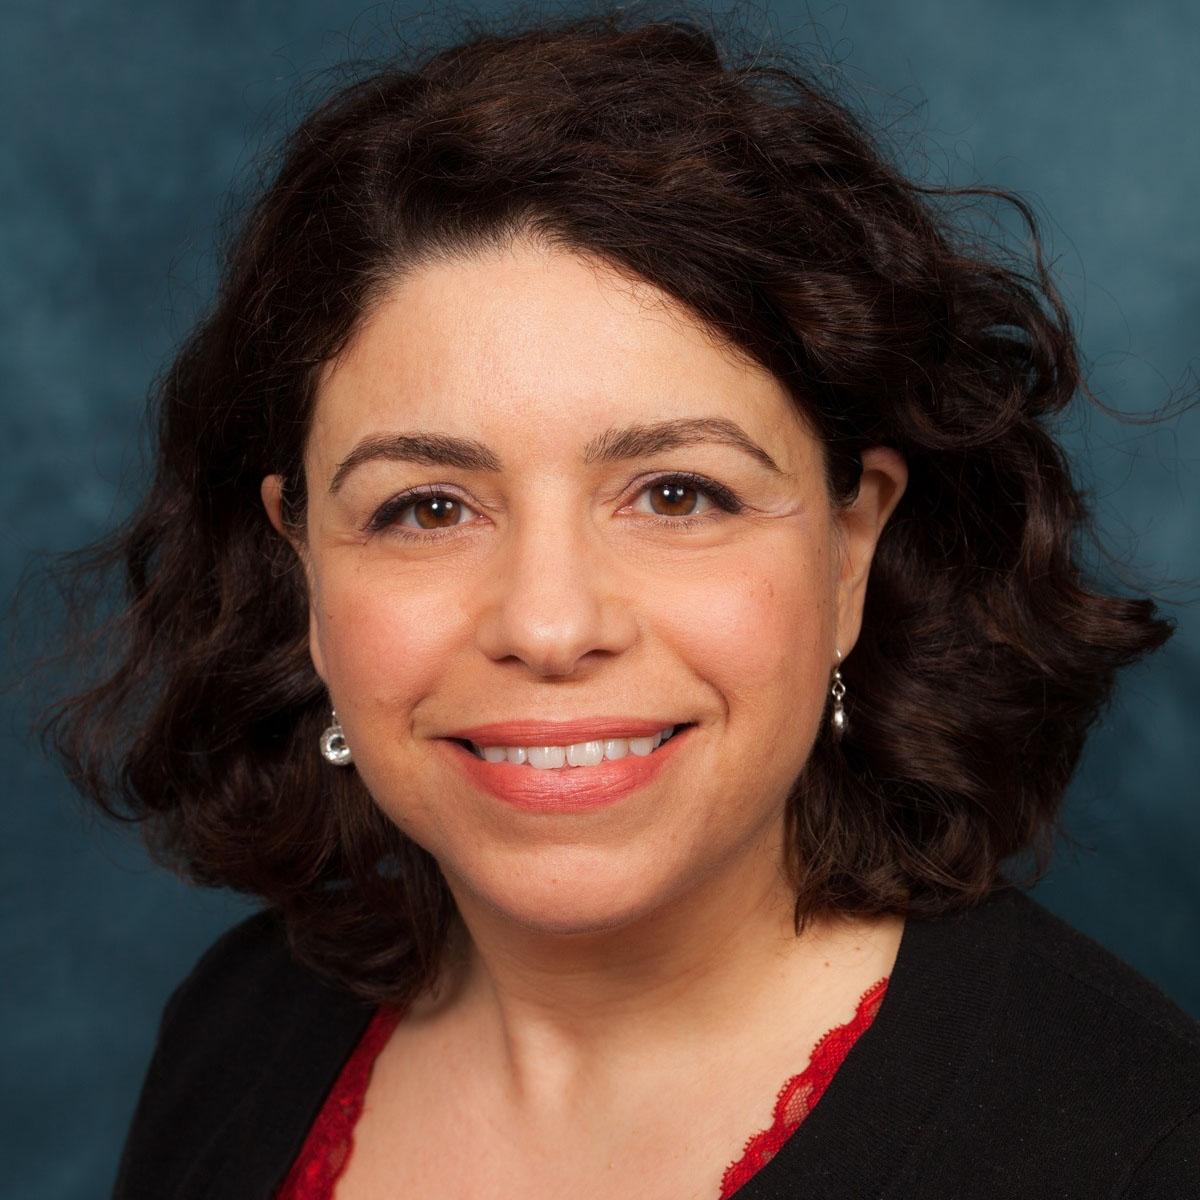 Claire Kalpakjian ACRM Plenary Presenter 2021